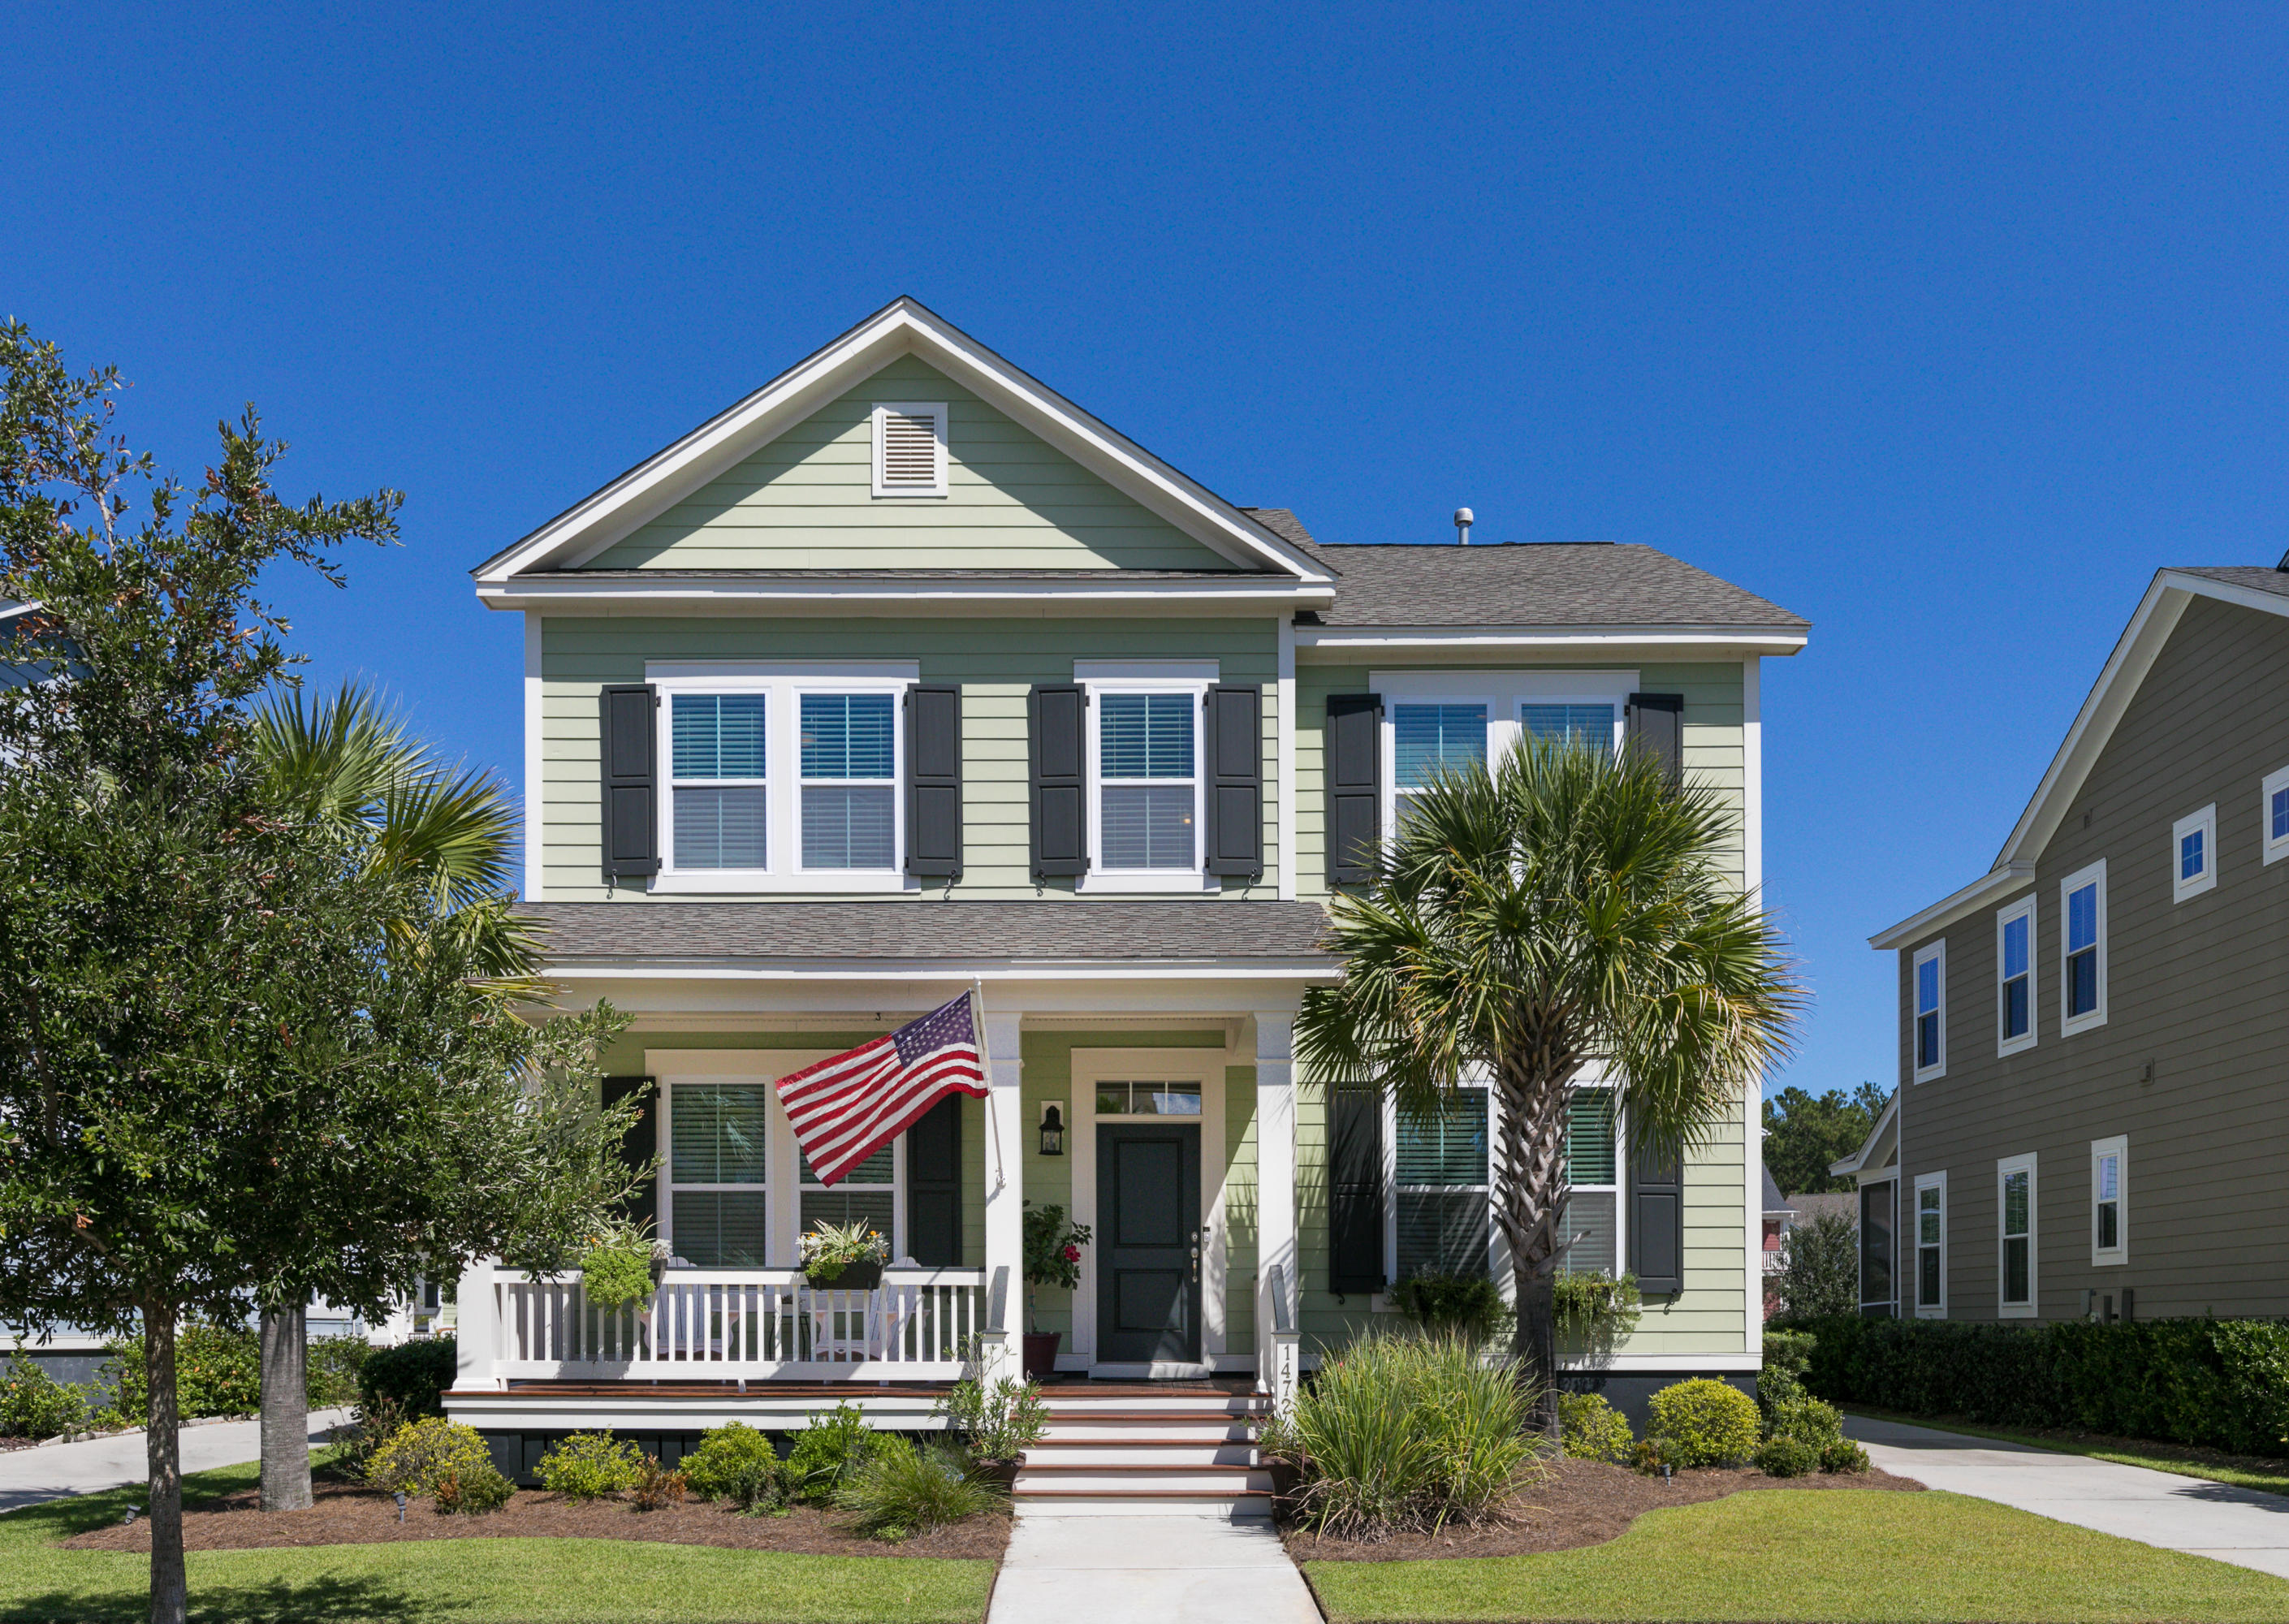 Carolina Park Homes For Sale - 1472 Croaton, Mount Pleasant, SC - 28